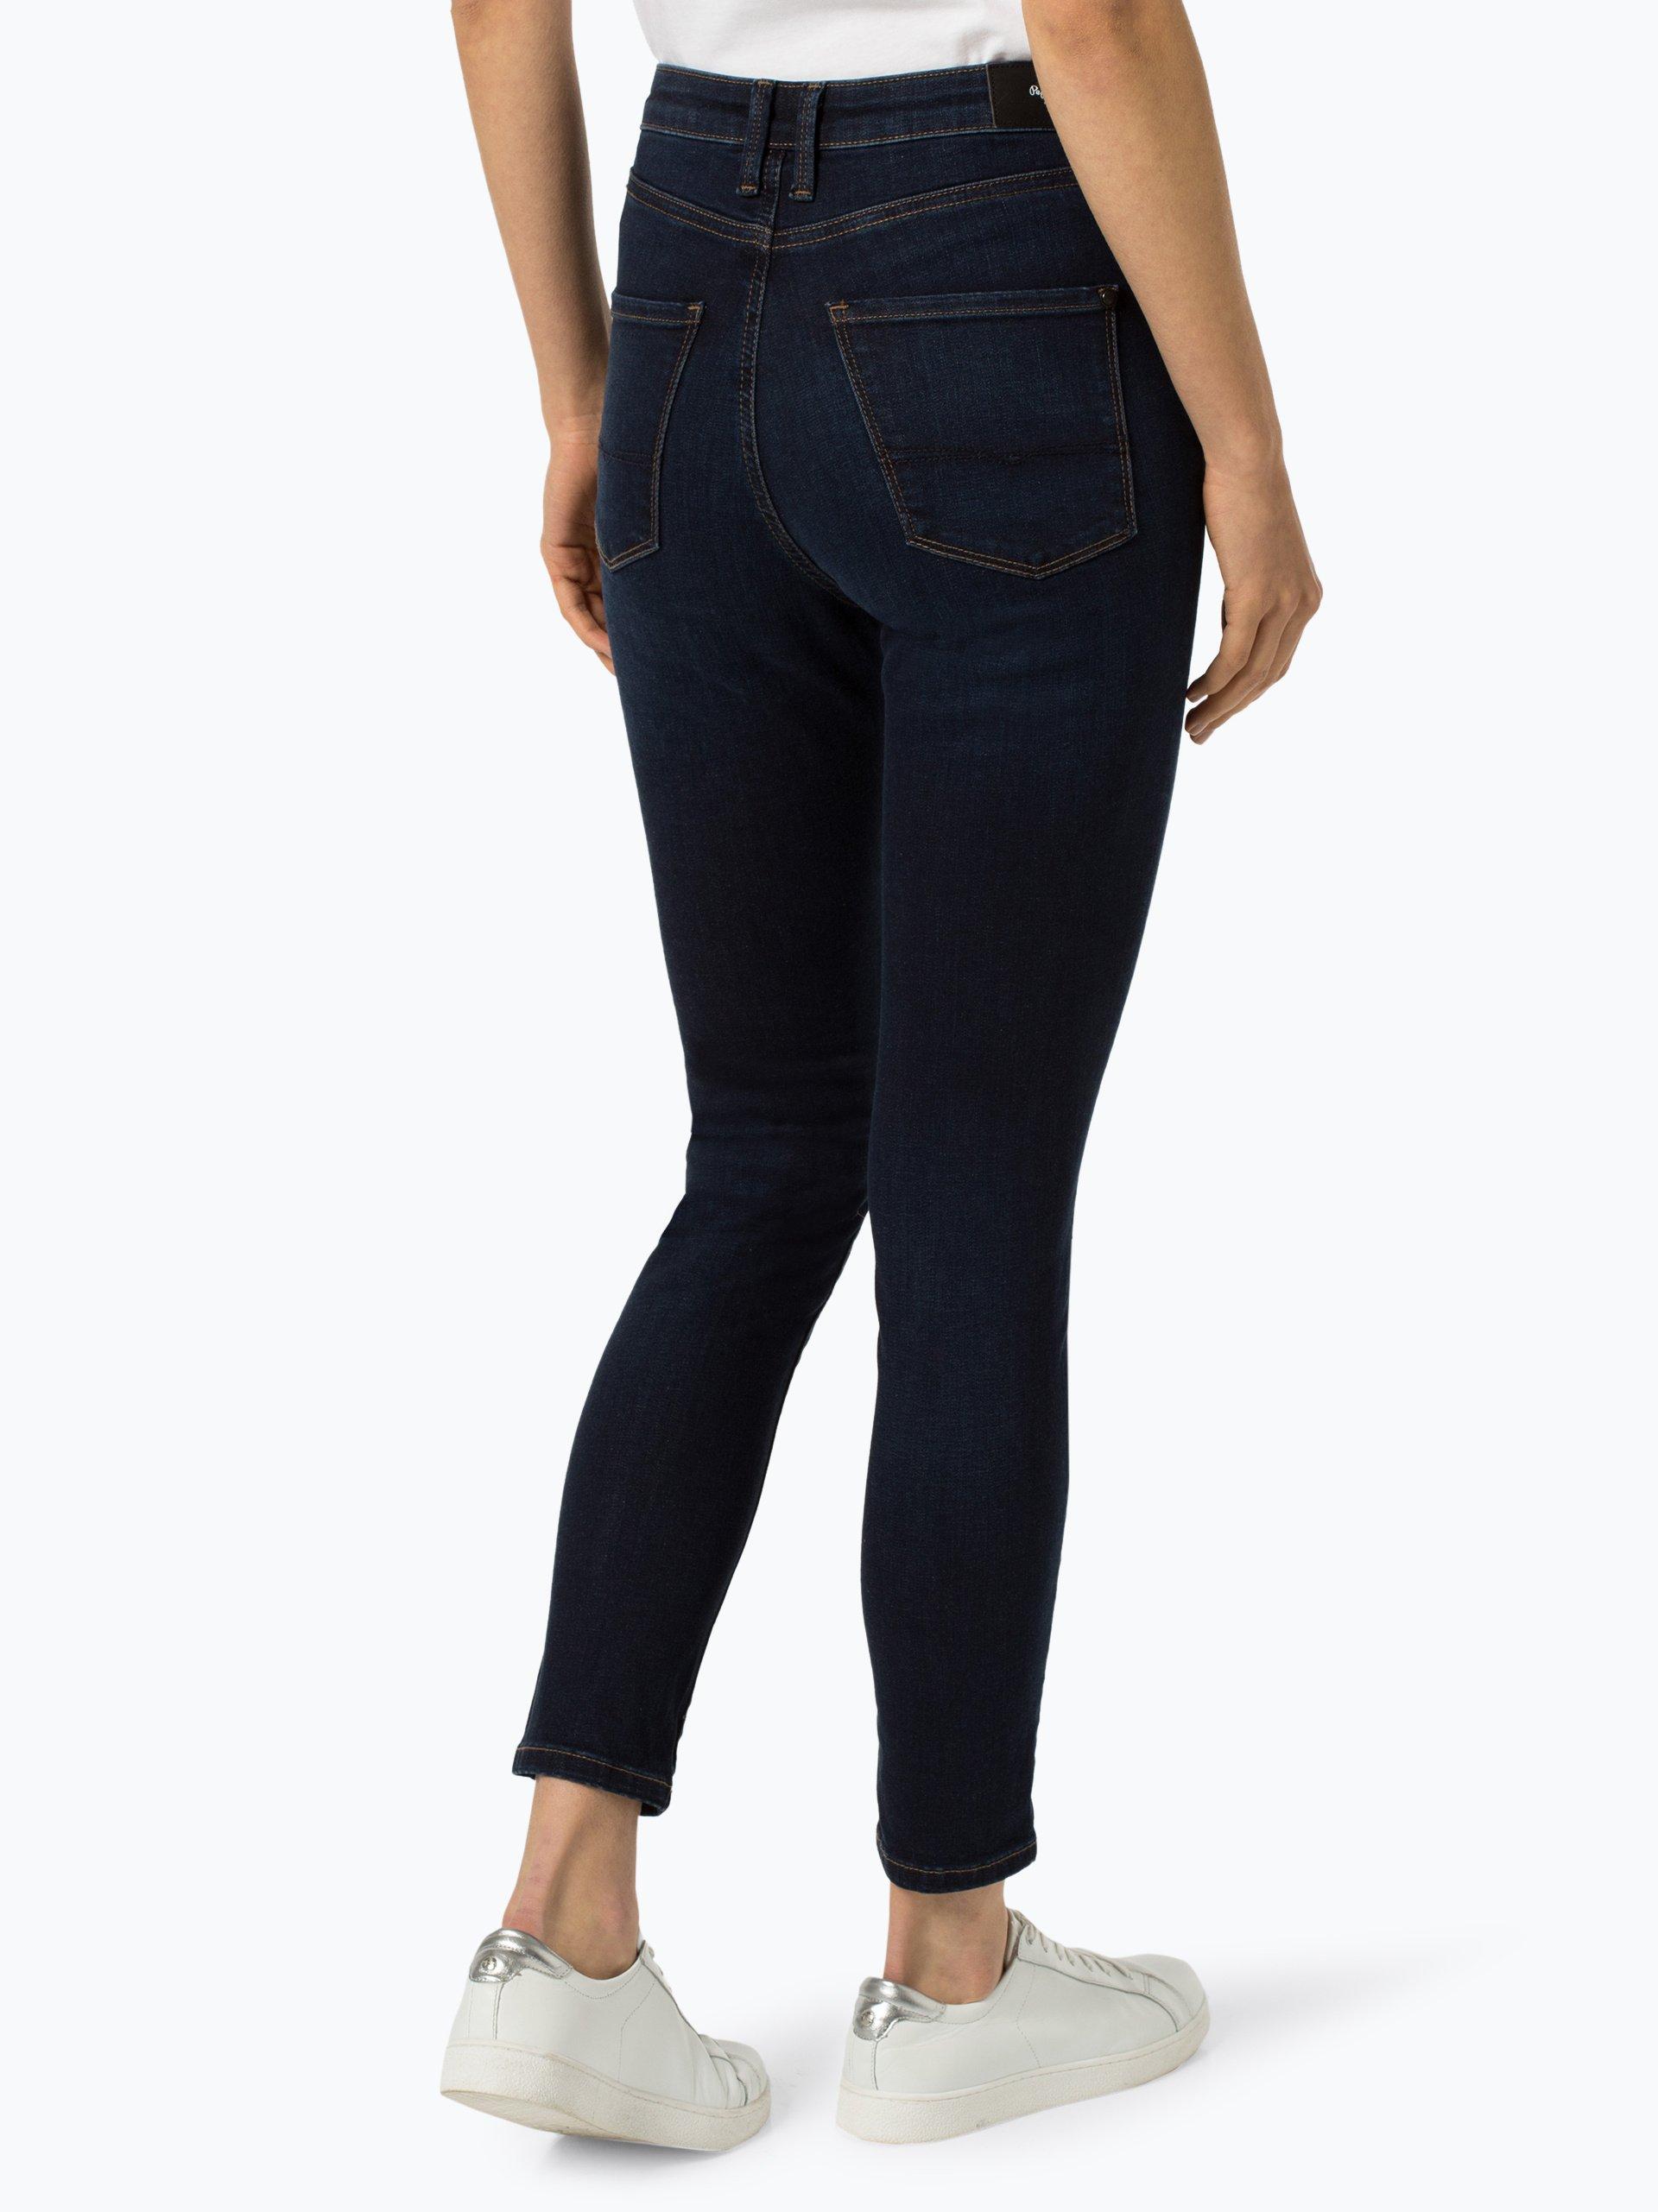 Pepe Jeans Damen Jeans - Dion